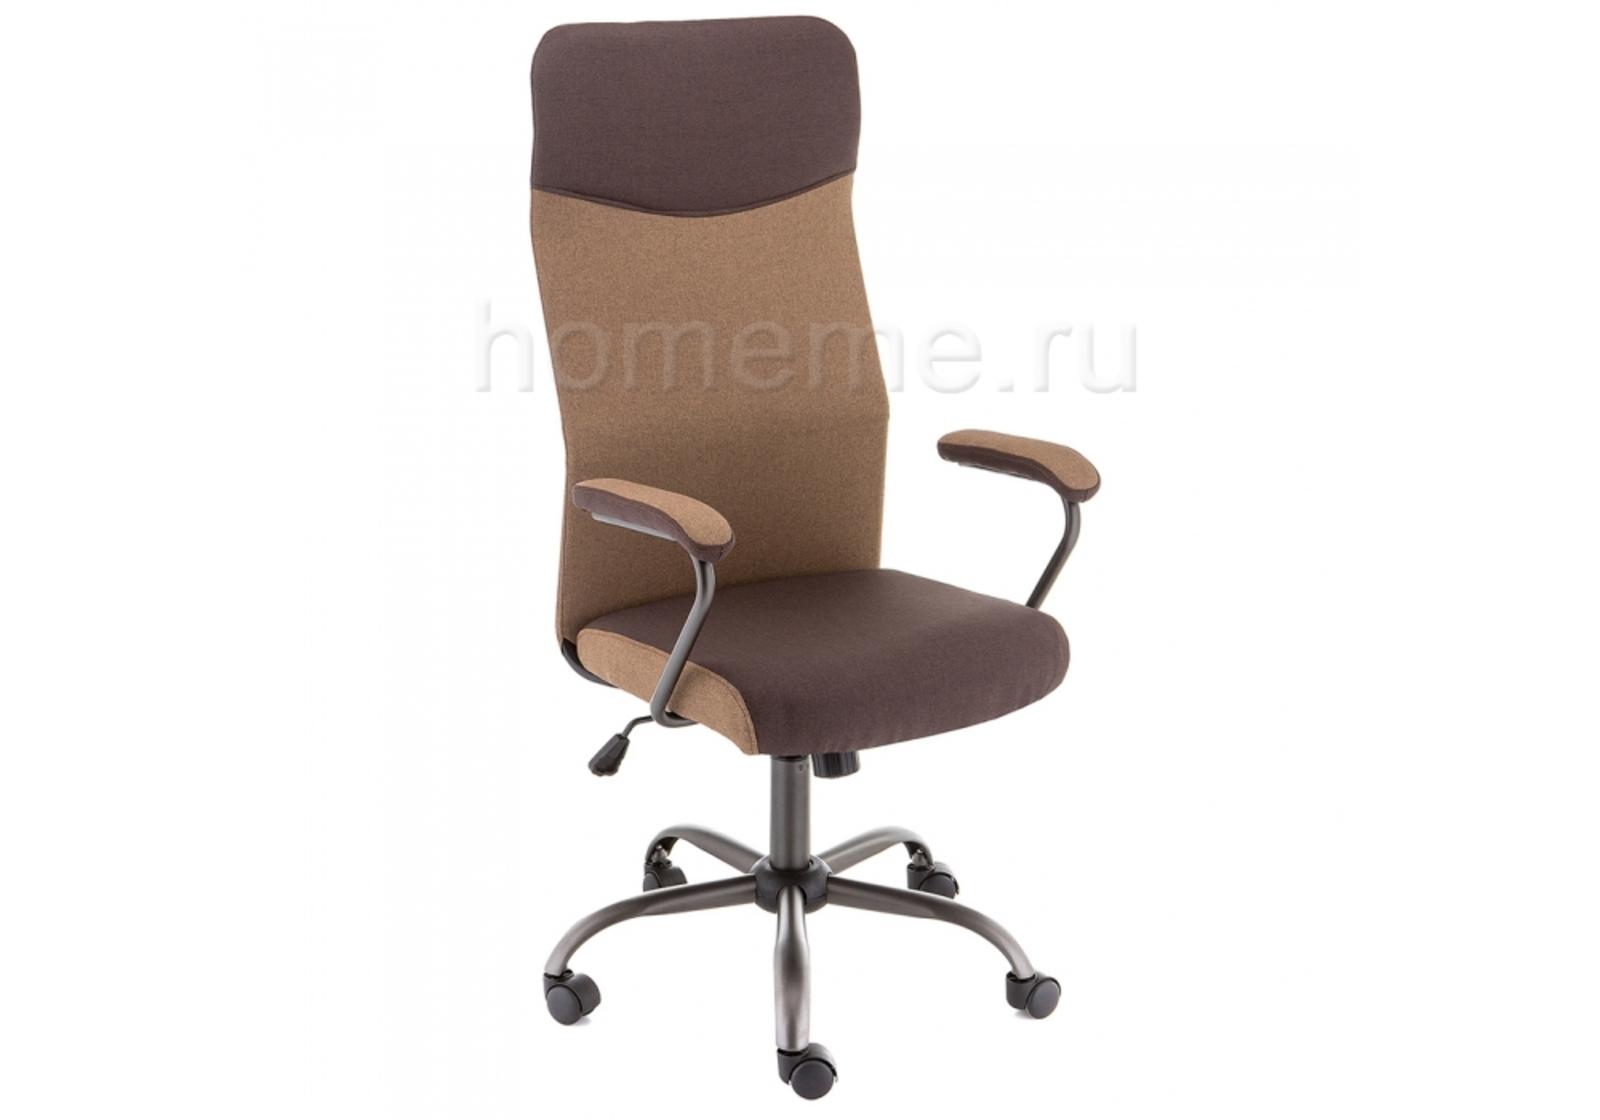 Кресло для офиса HomeMe Aven коричневое 11279 от Homeme.ru